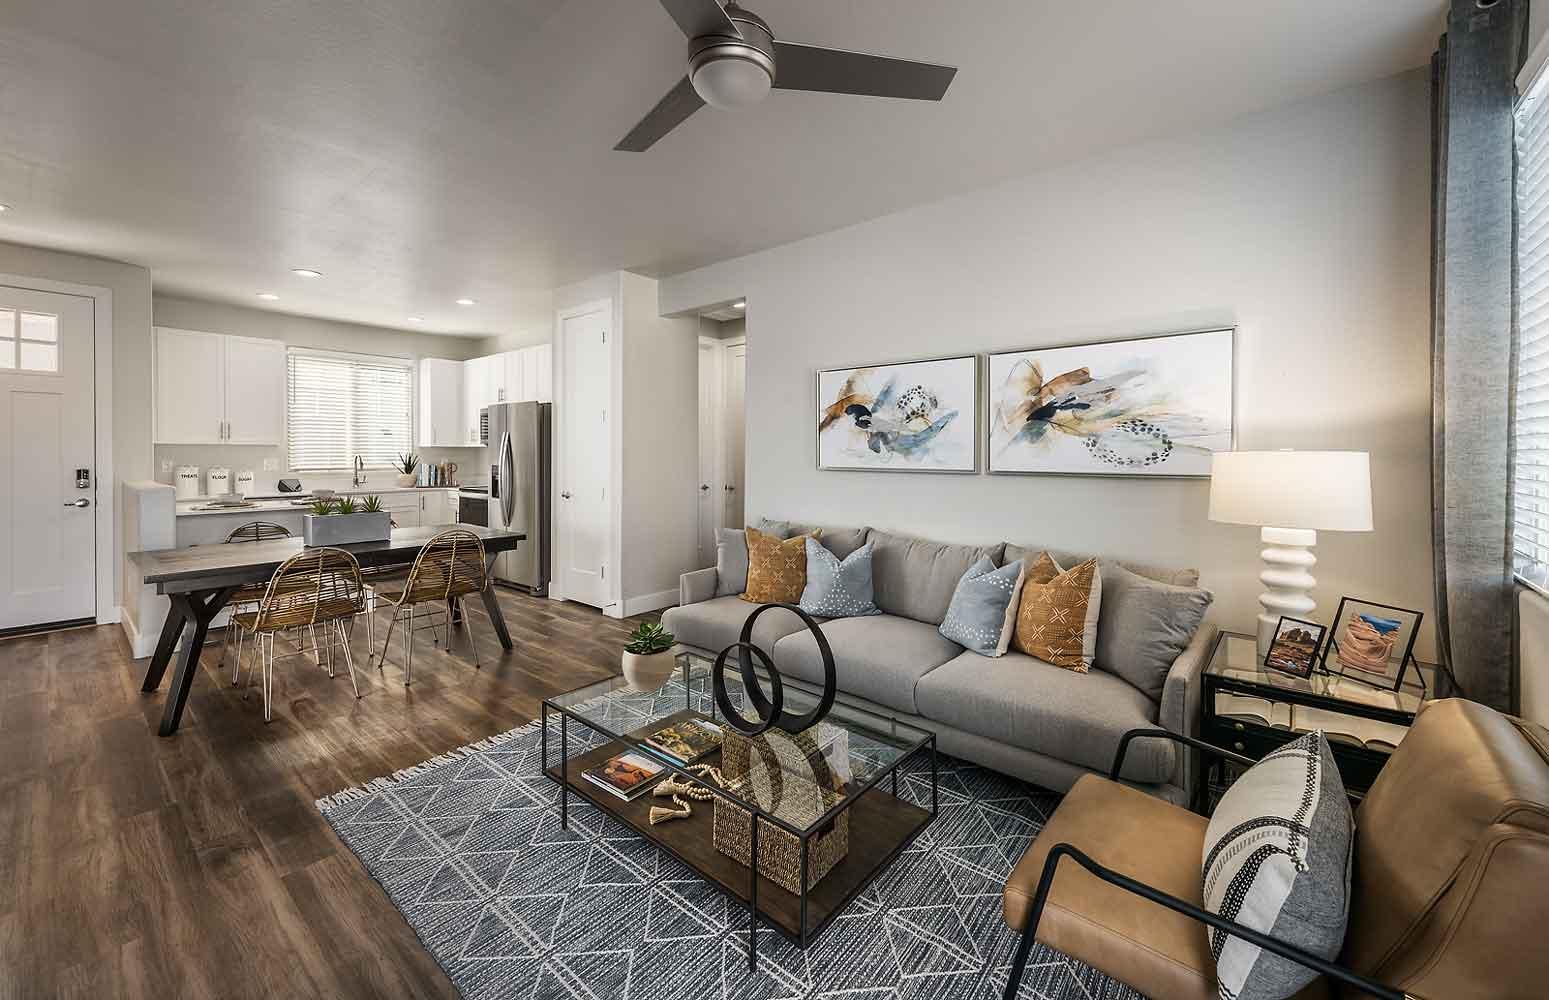 Stylish Apartments at Harvard Crossing Apartments in Goodyear, AZ